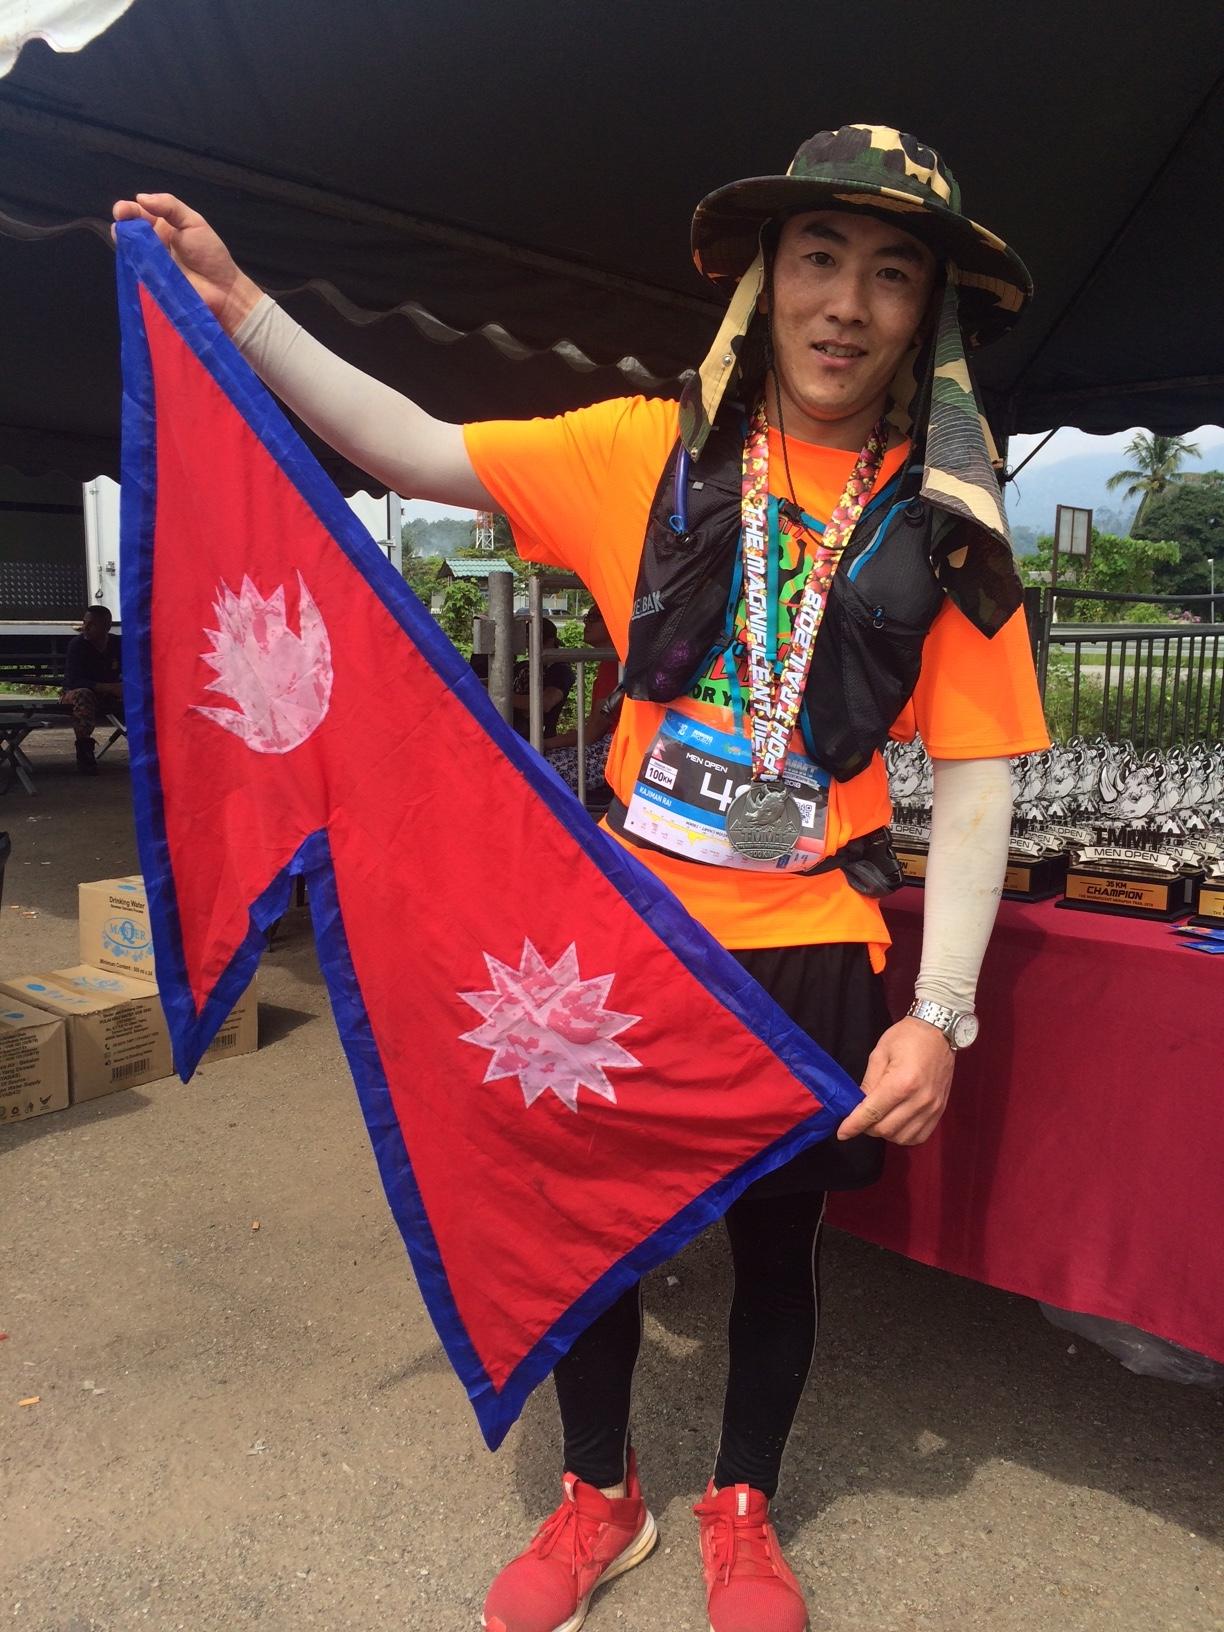 Kajiman Rai from Nepal was an excellent 7th in the 100km race